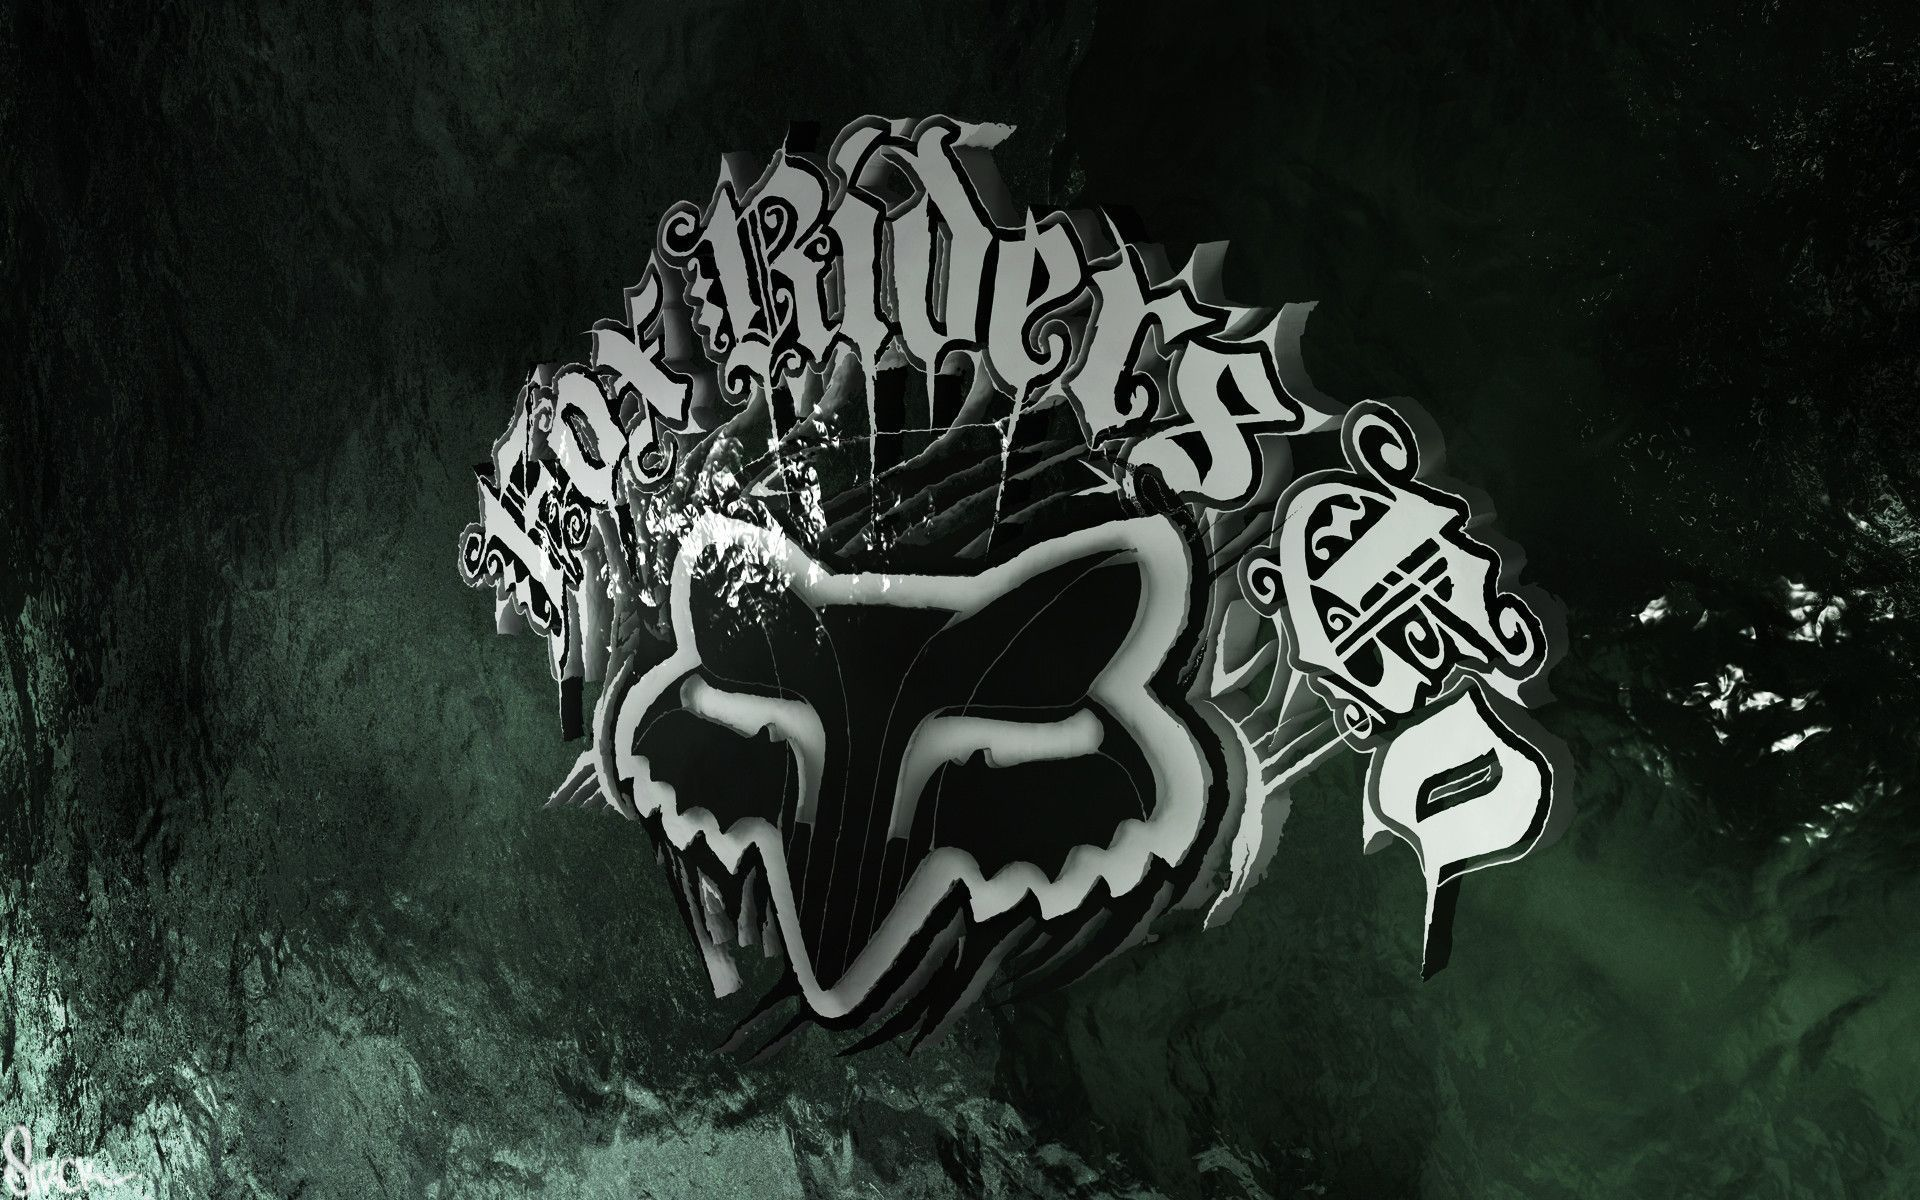 Hd wallpaper cave - Fox Racing Logo Wallpapers Wallpaper Cave